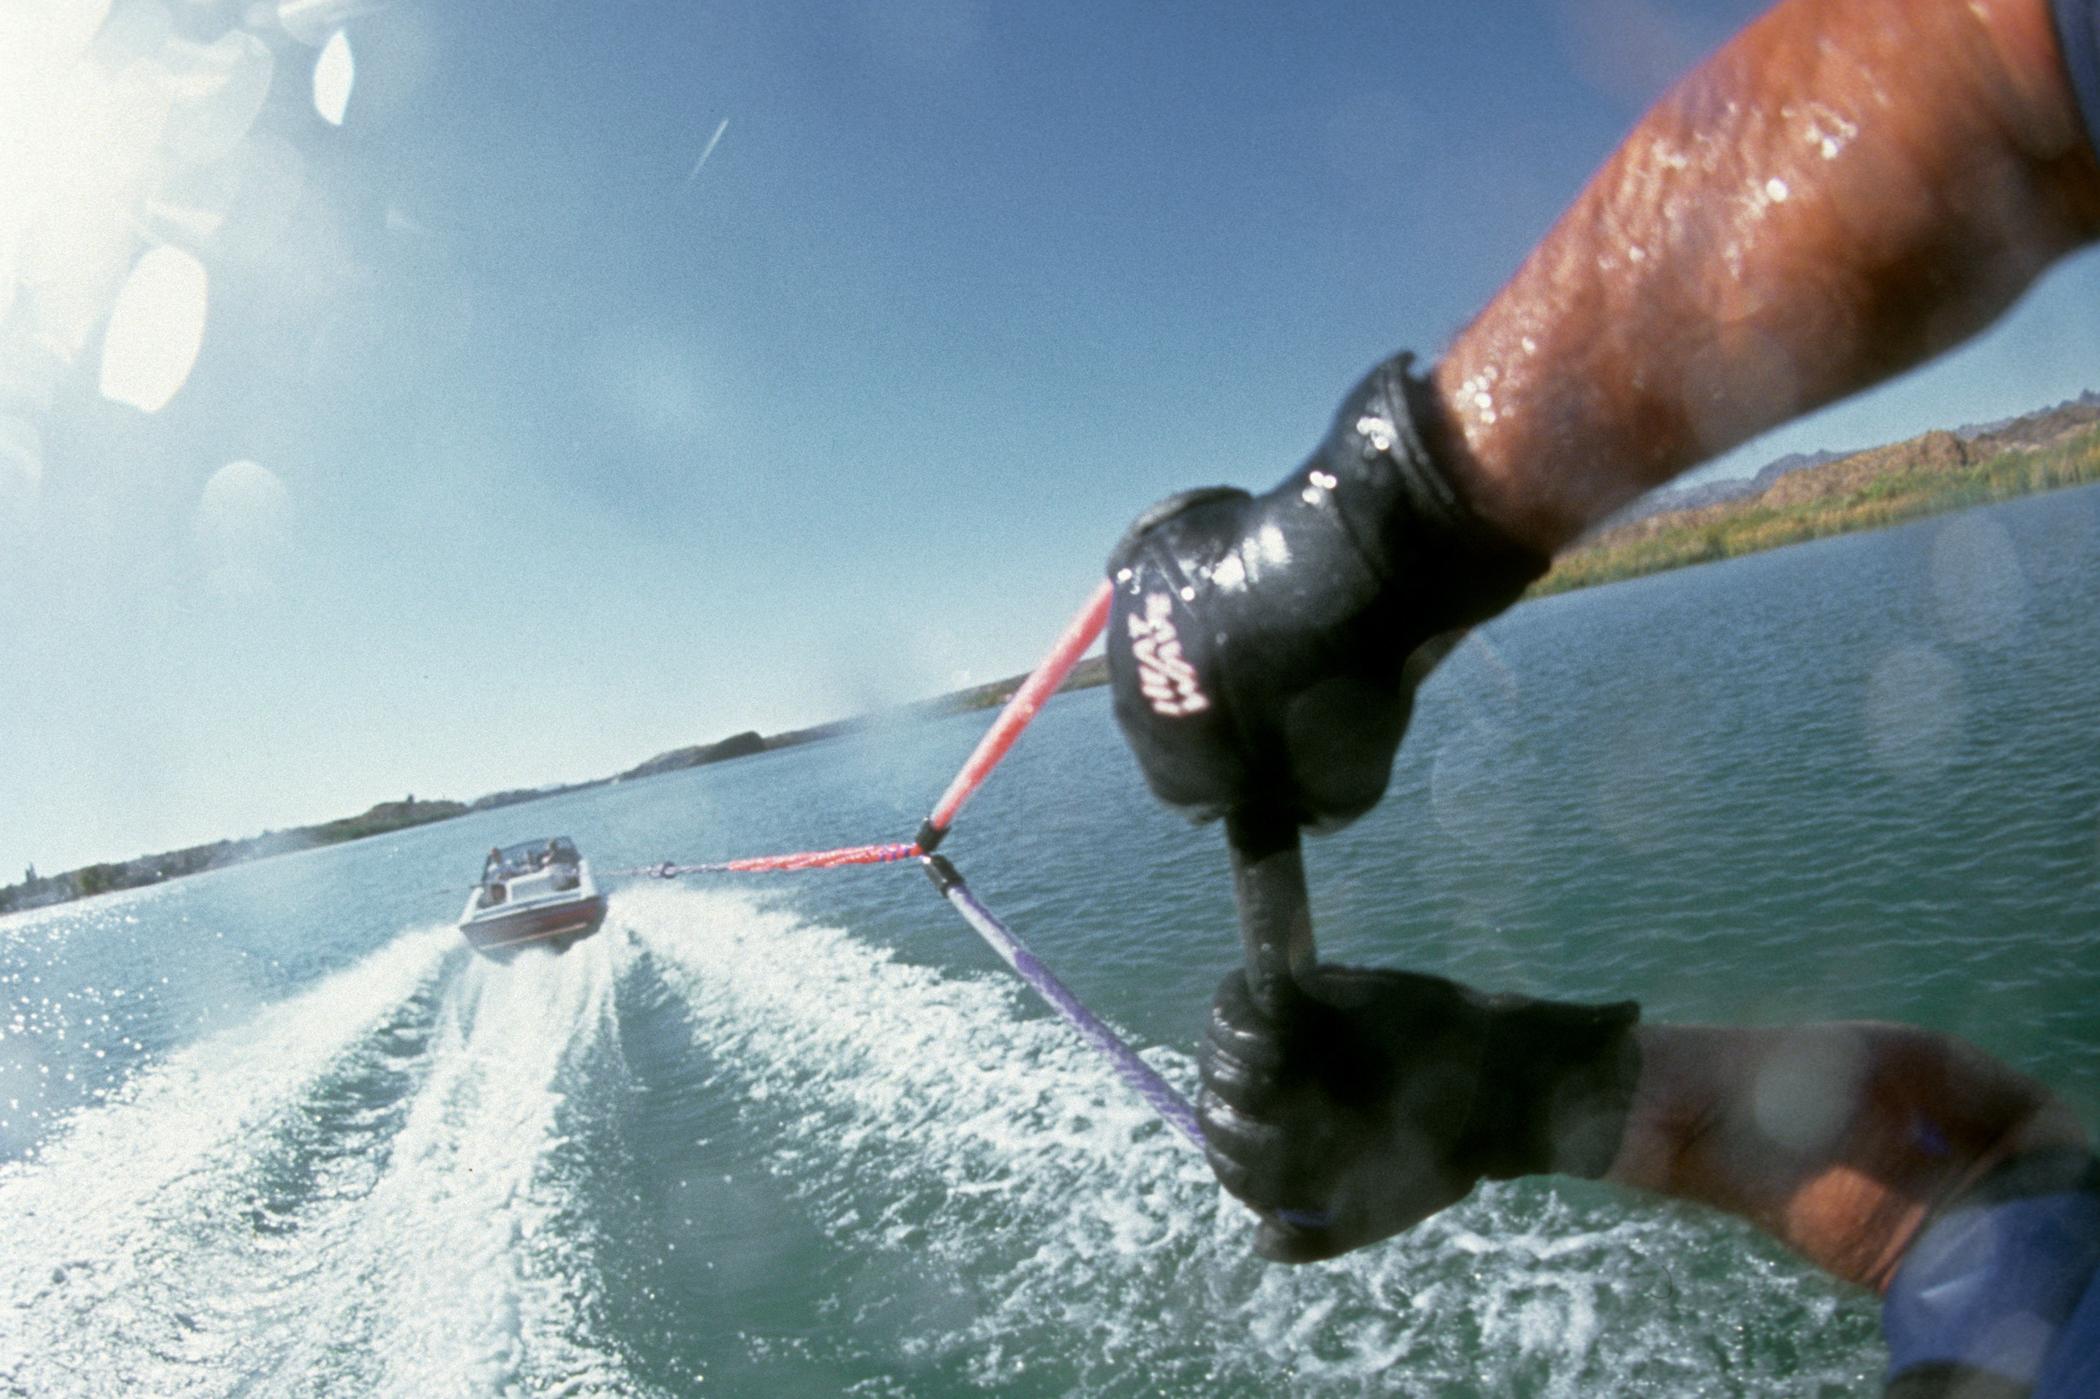 h_TonyKlarich.com_Water_Skiing_GoPro_HELMETCAMFOIL_Creative_Commons_Free_3MR